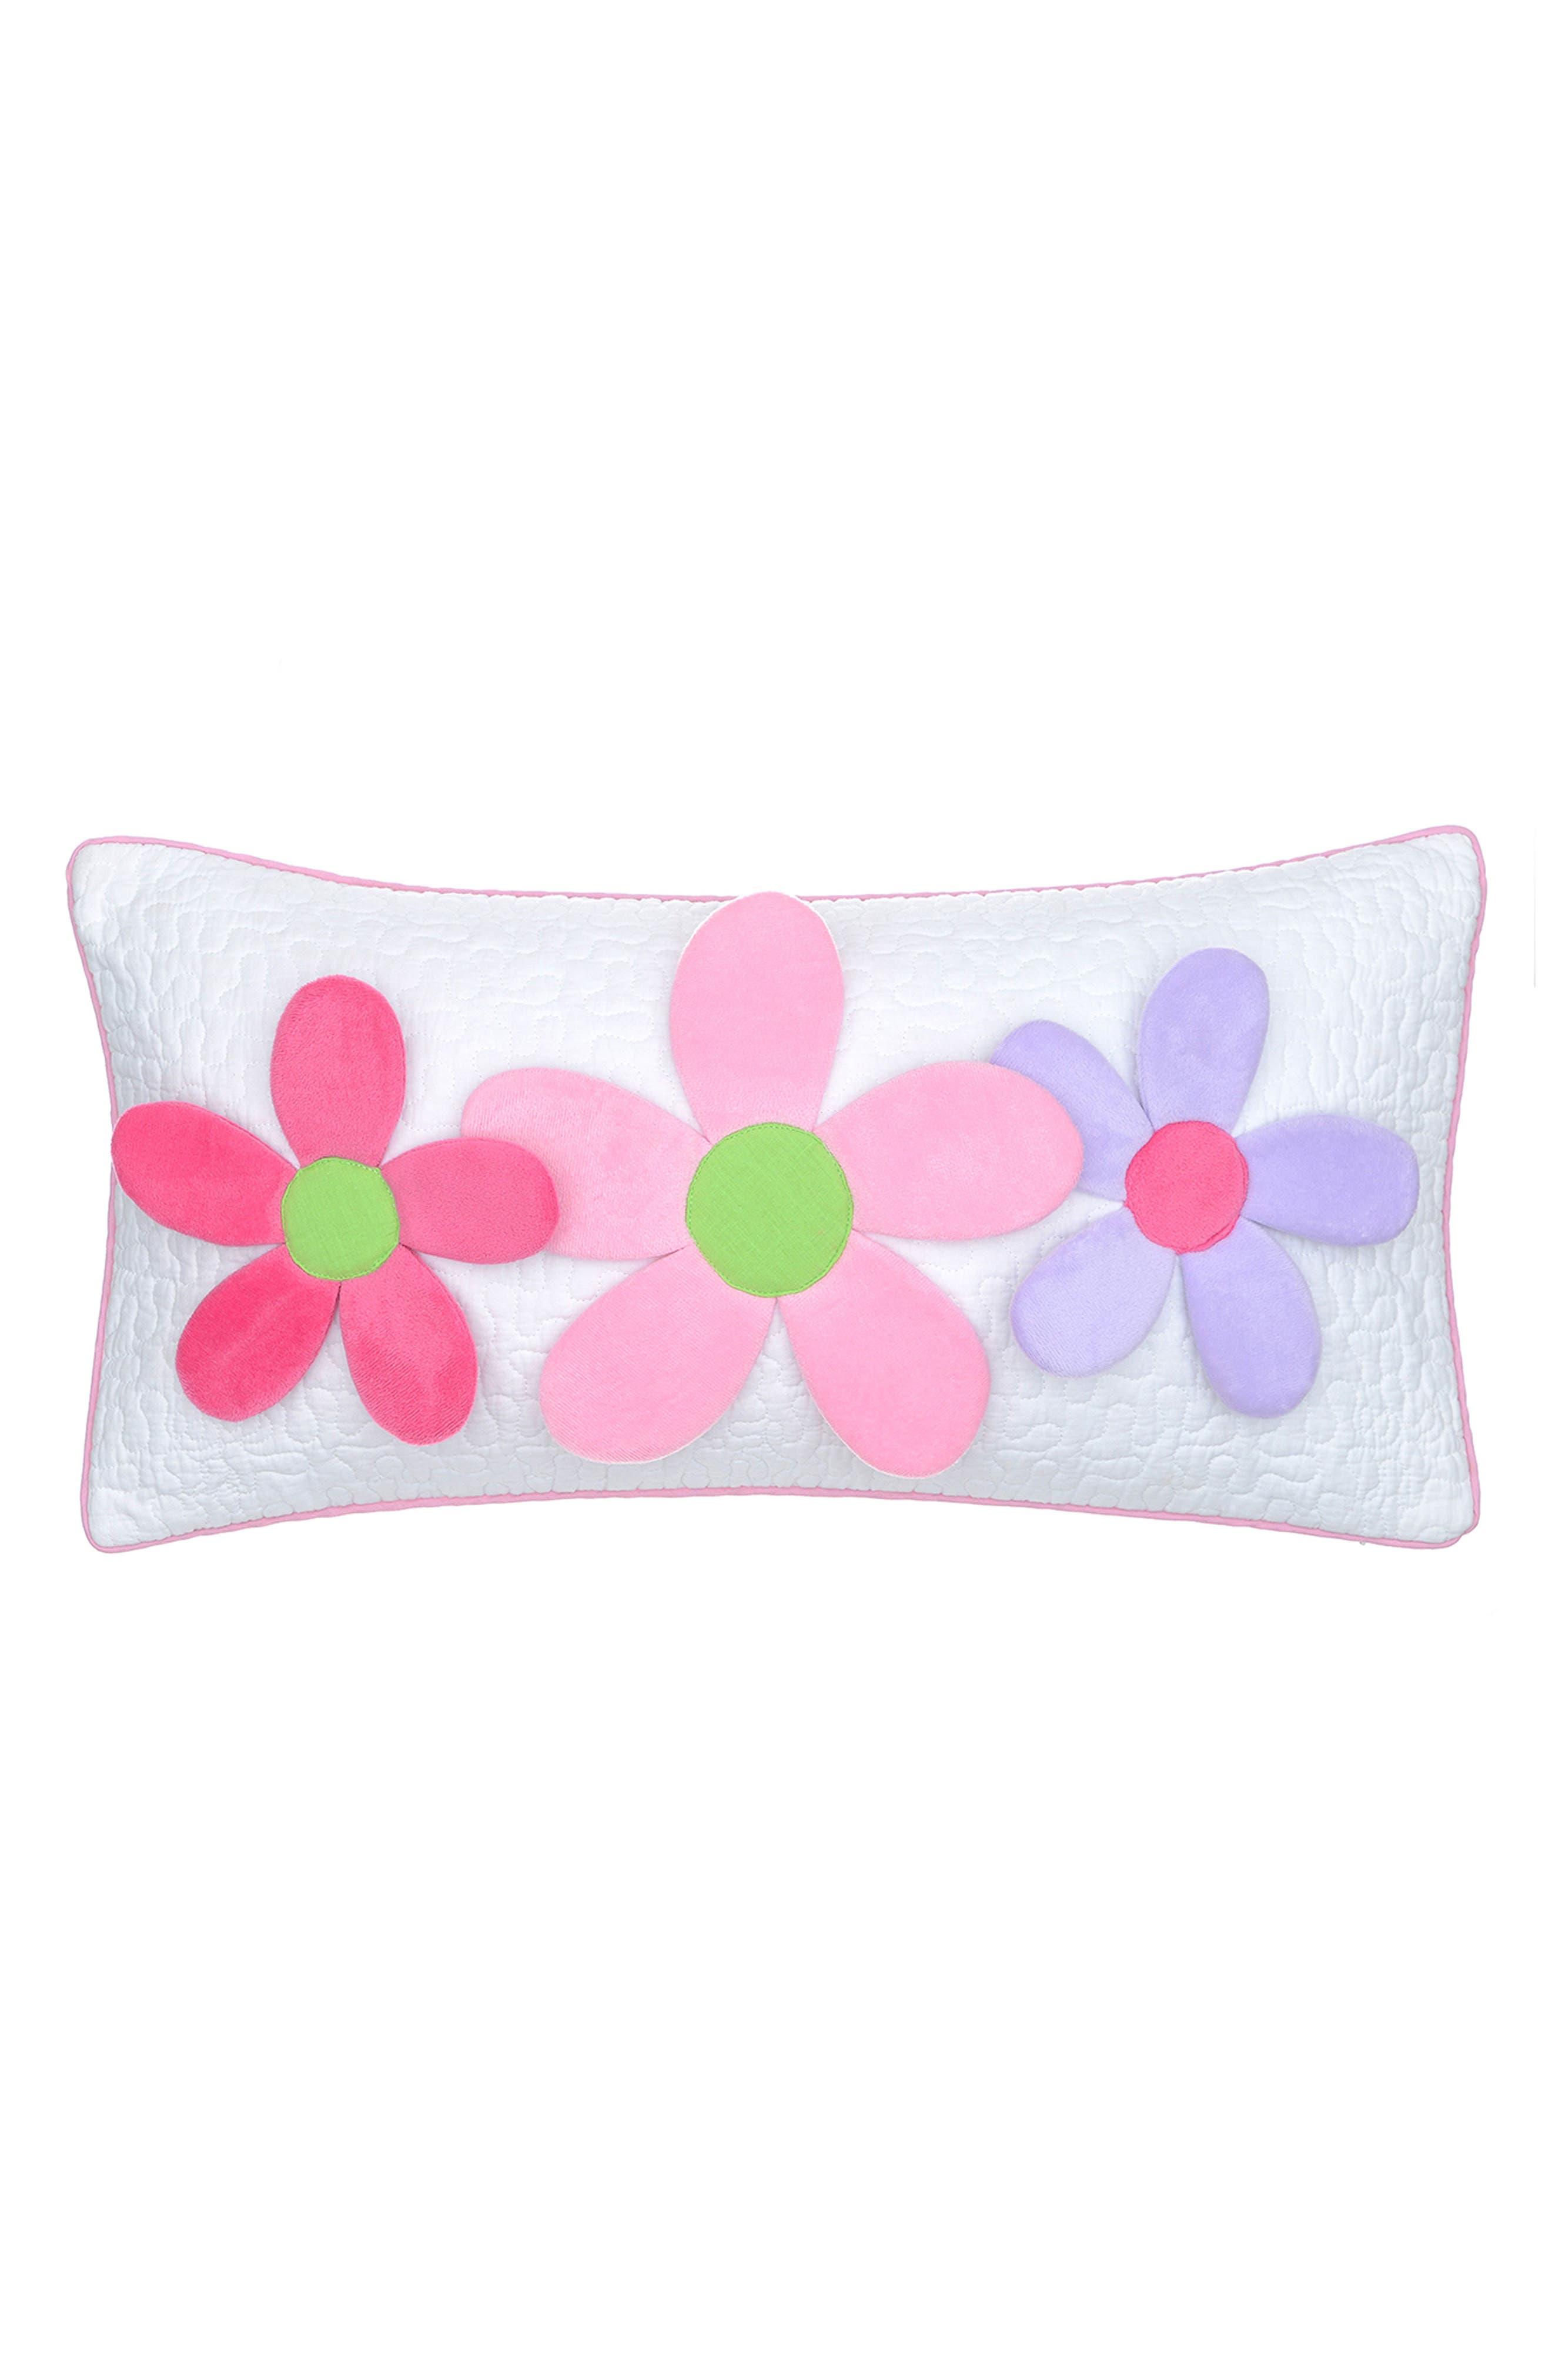 Main Image - Levtex Nina Flowers Accent Pillow